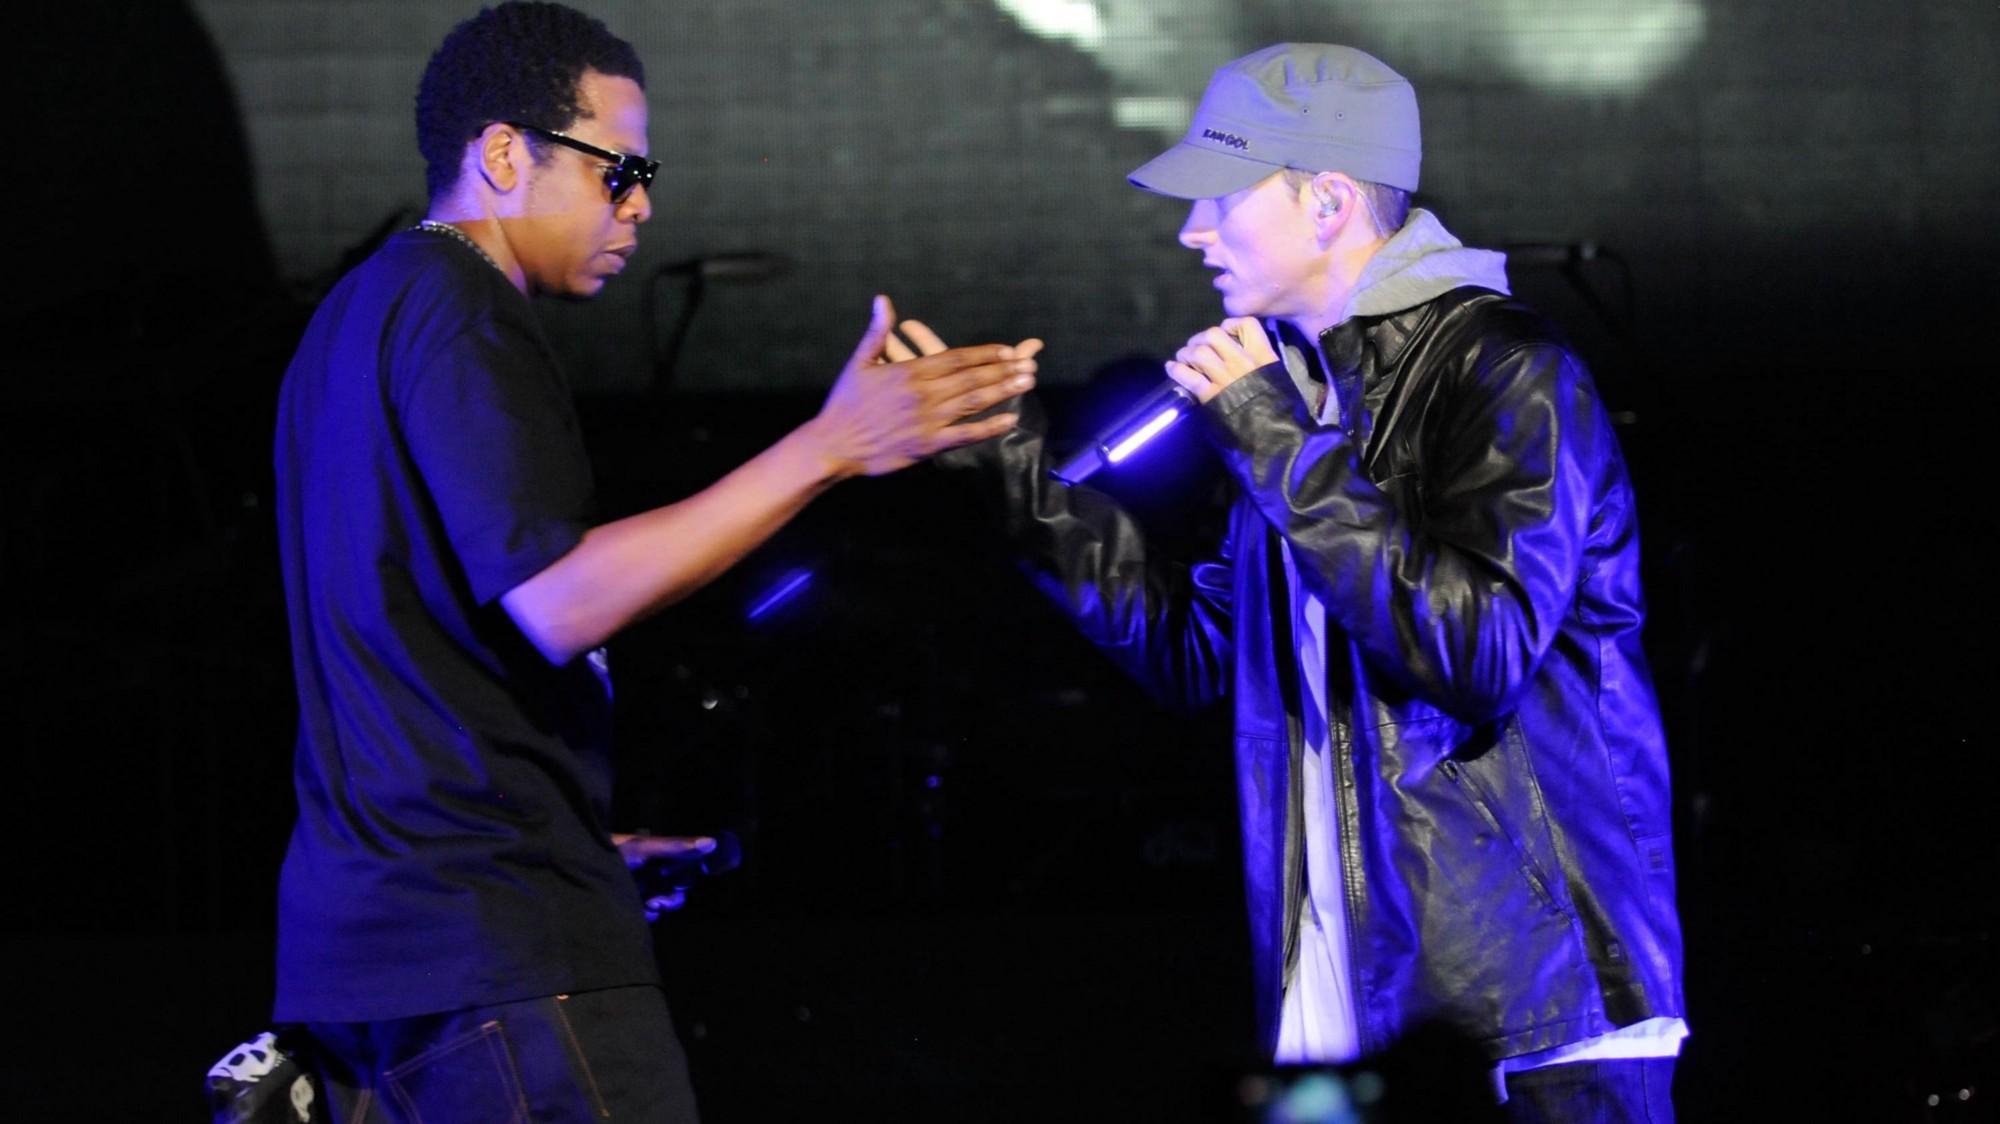 JAY Z,EminemSueTheHarveyWeinsteinCompanyOverUnpaidDeals